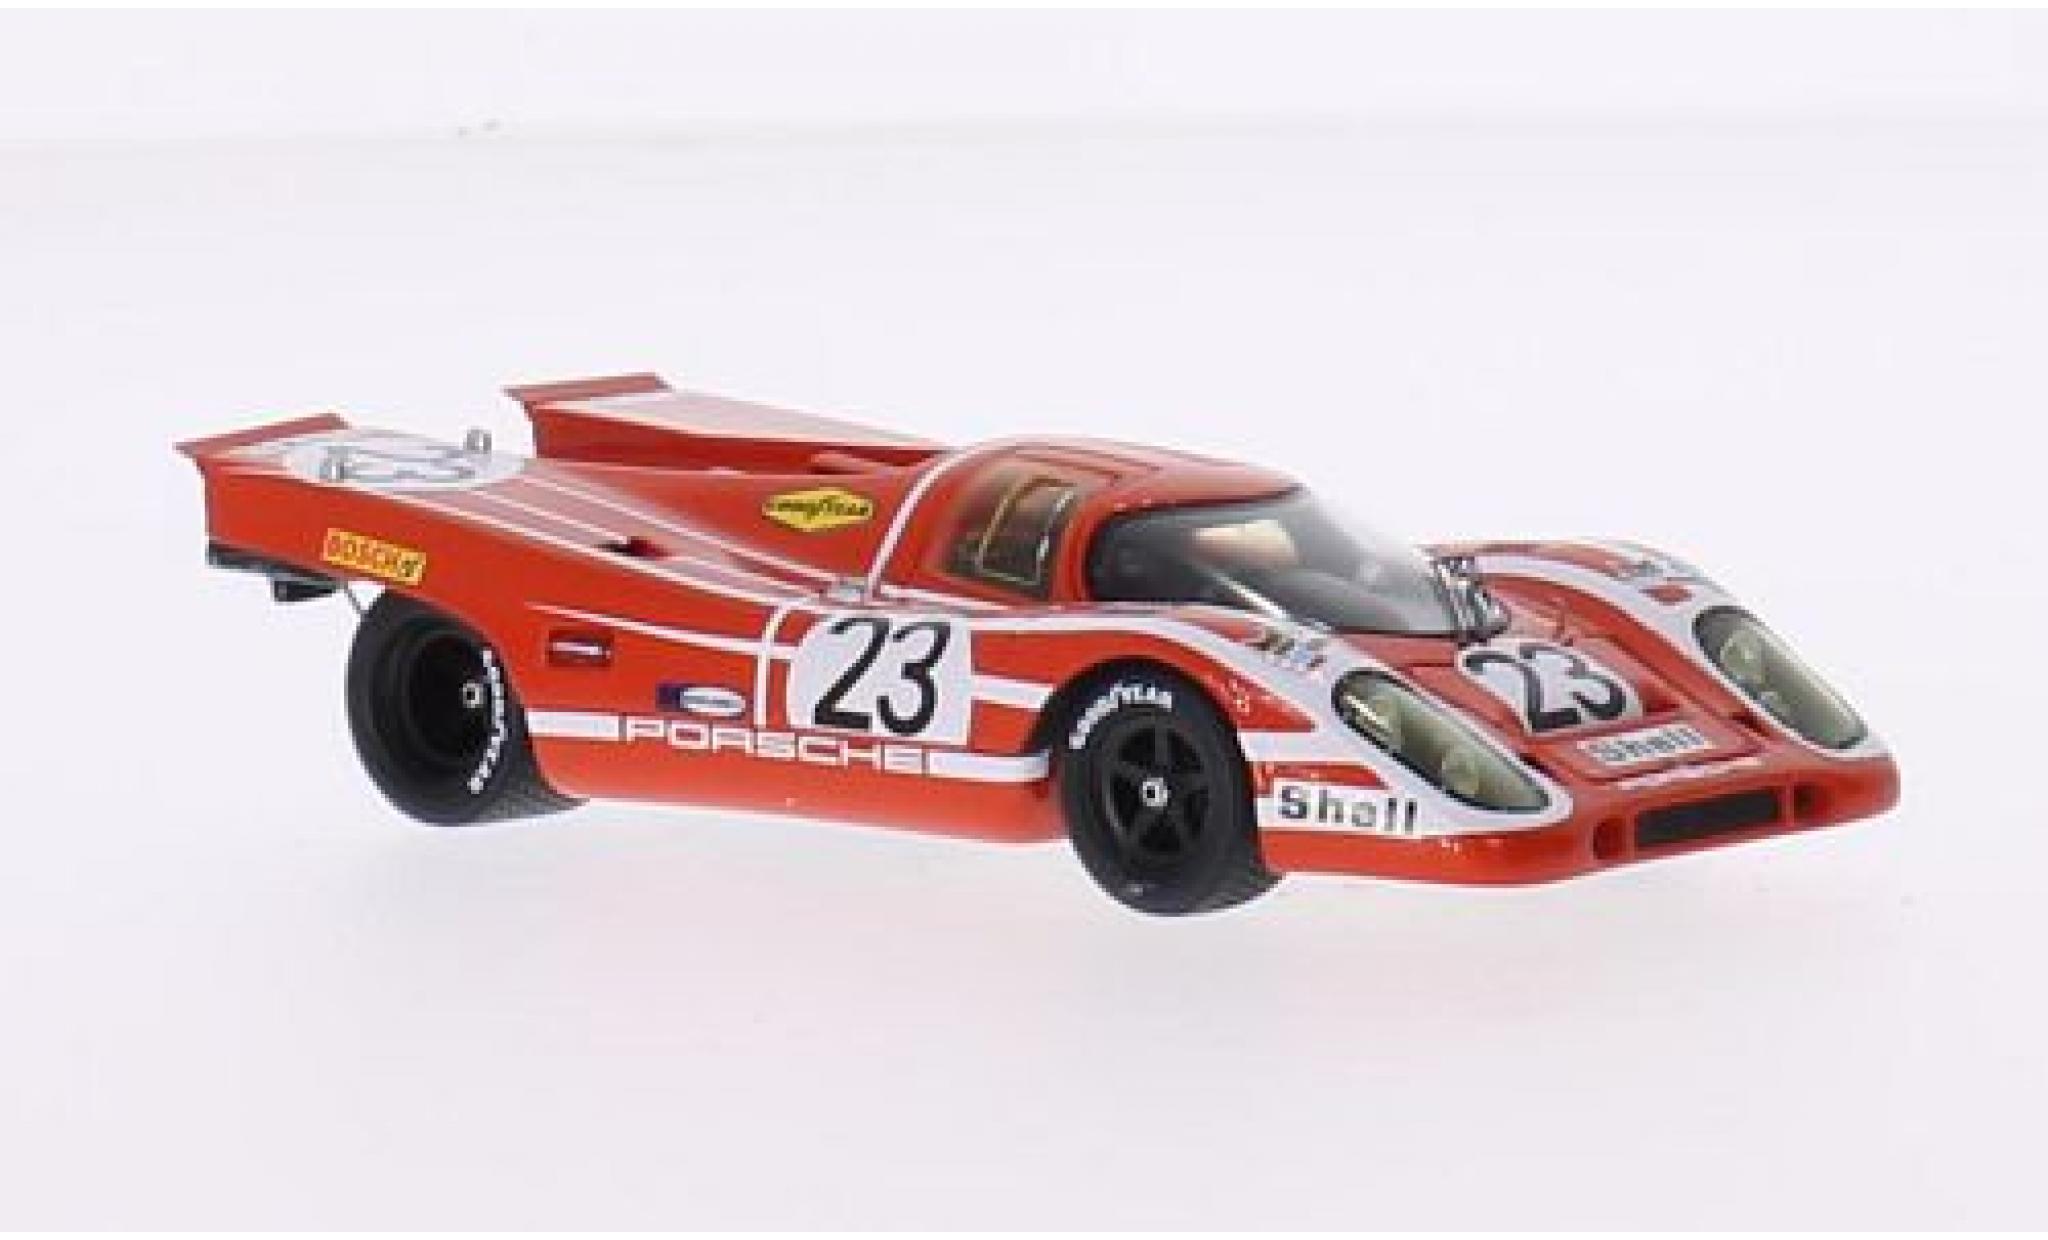 Porsche 917 1970 1/43 Spark K No.23 KG Salzburg S 24h Le Mans H.Herrmann/R.Attwood